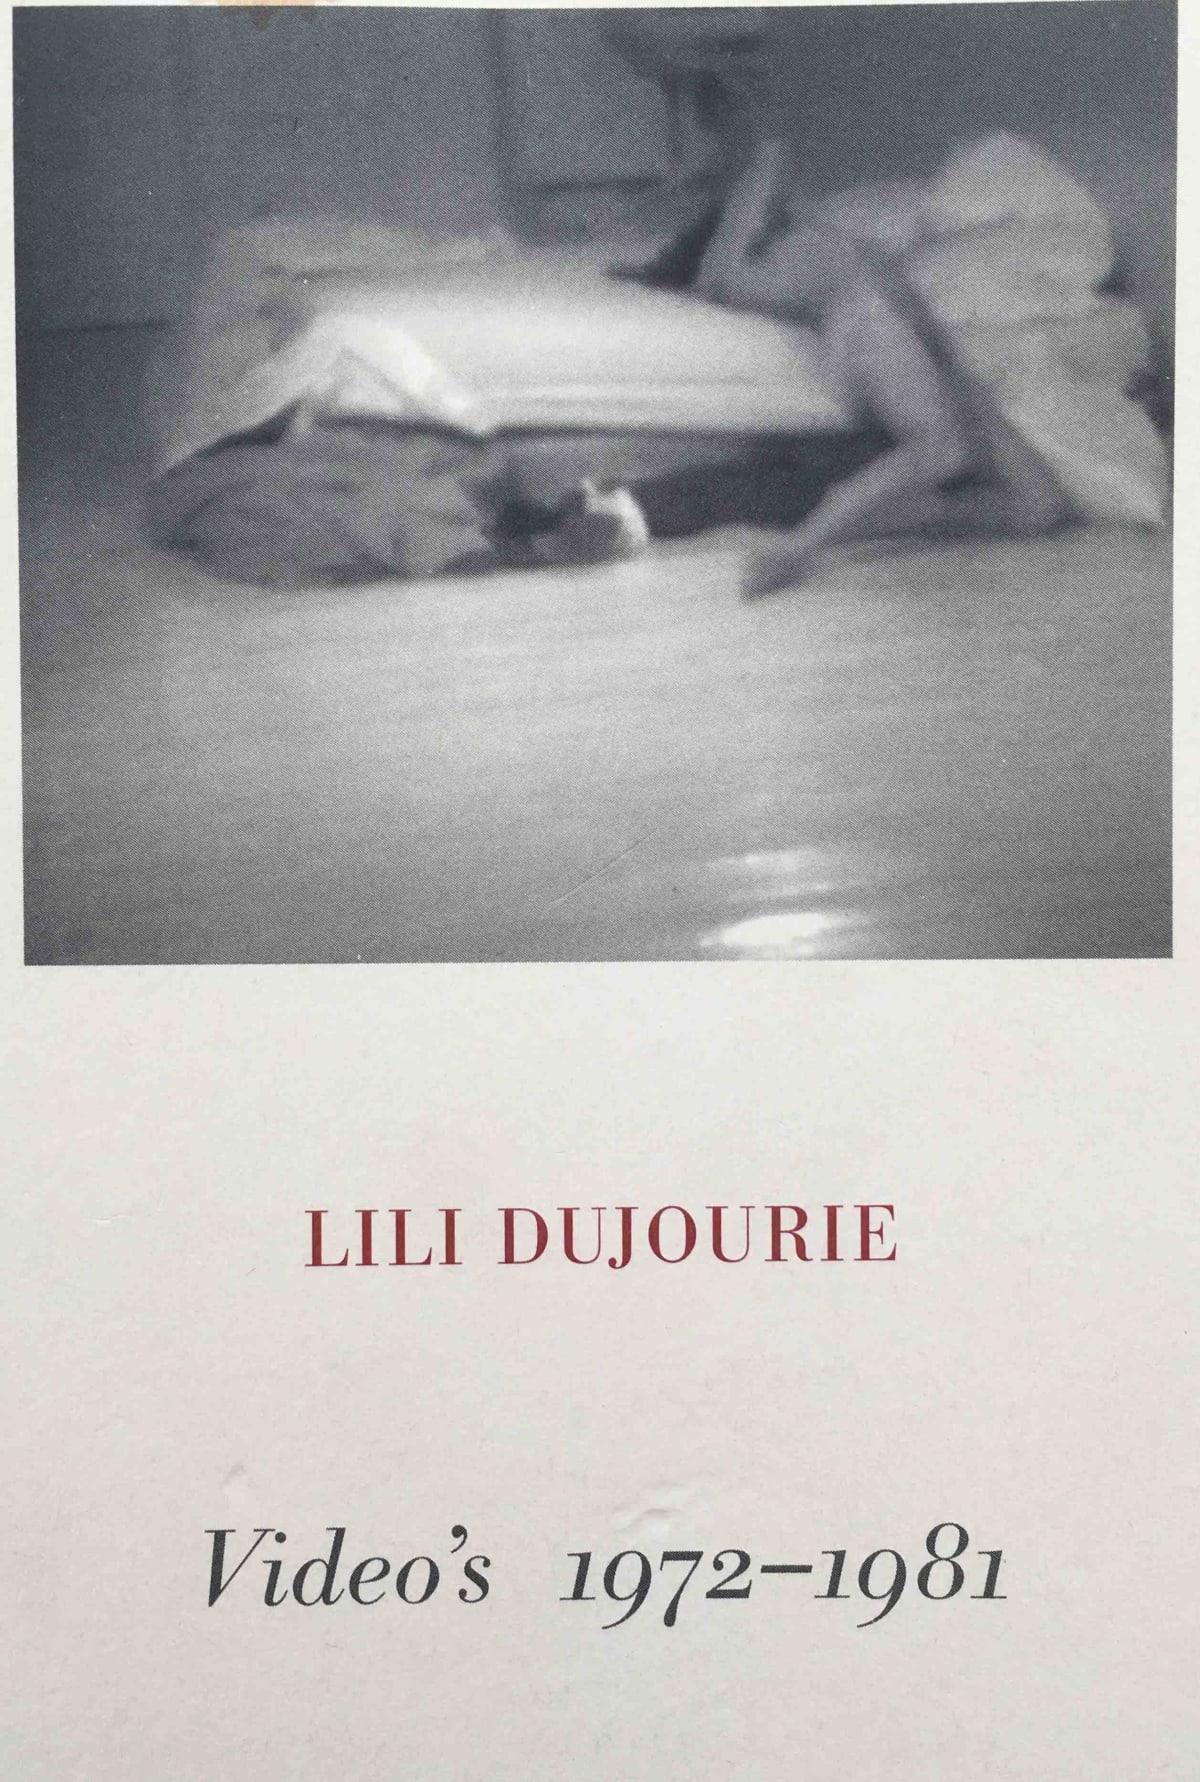 Videos 1972-1981_Lili_Dujourie_2002_book